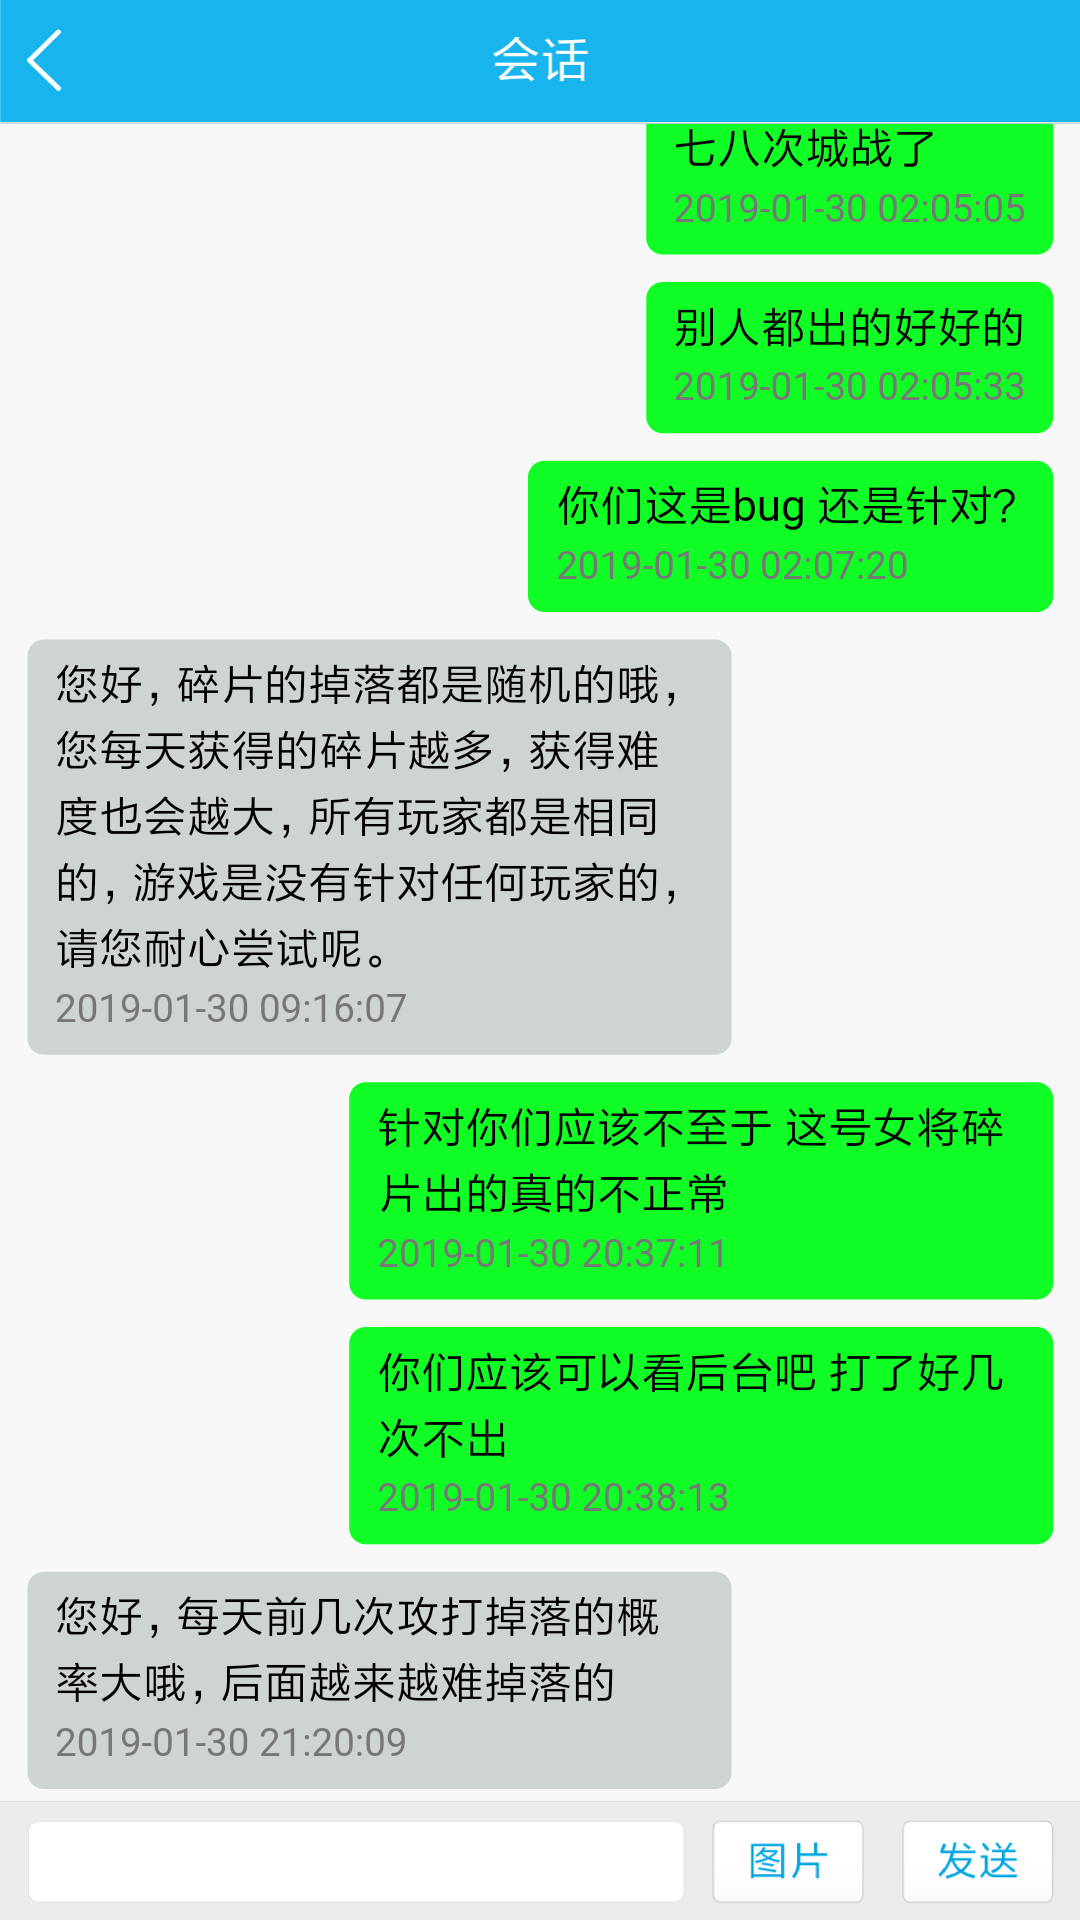 Screenshot_2019-01-31-01-26-45-605_com.jedigames.p16.mi.png